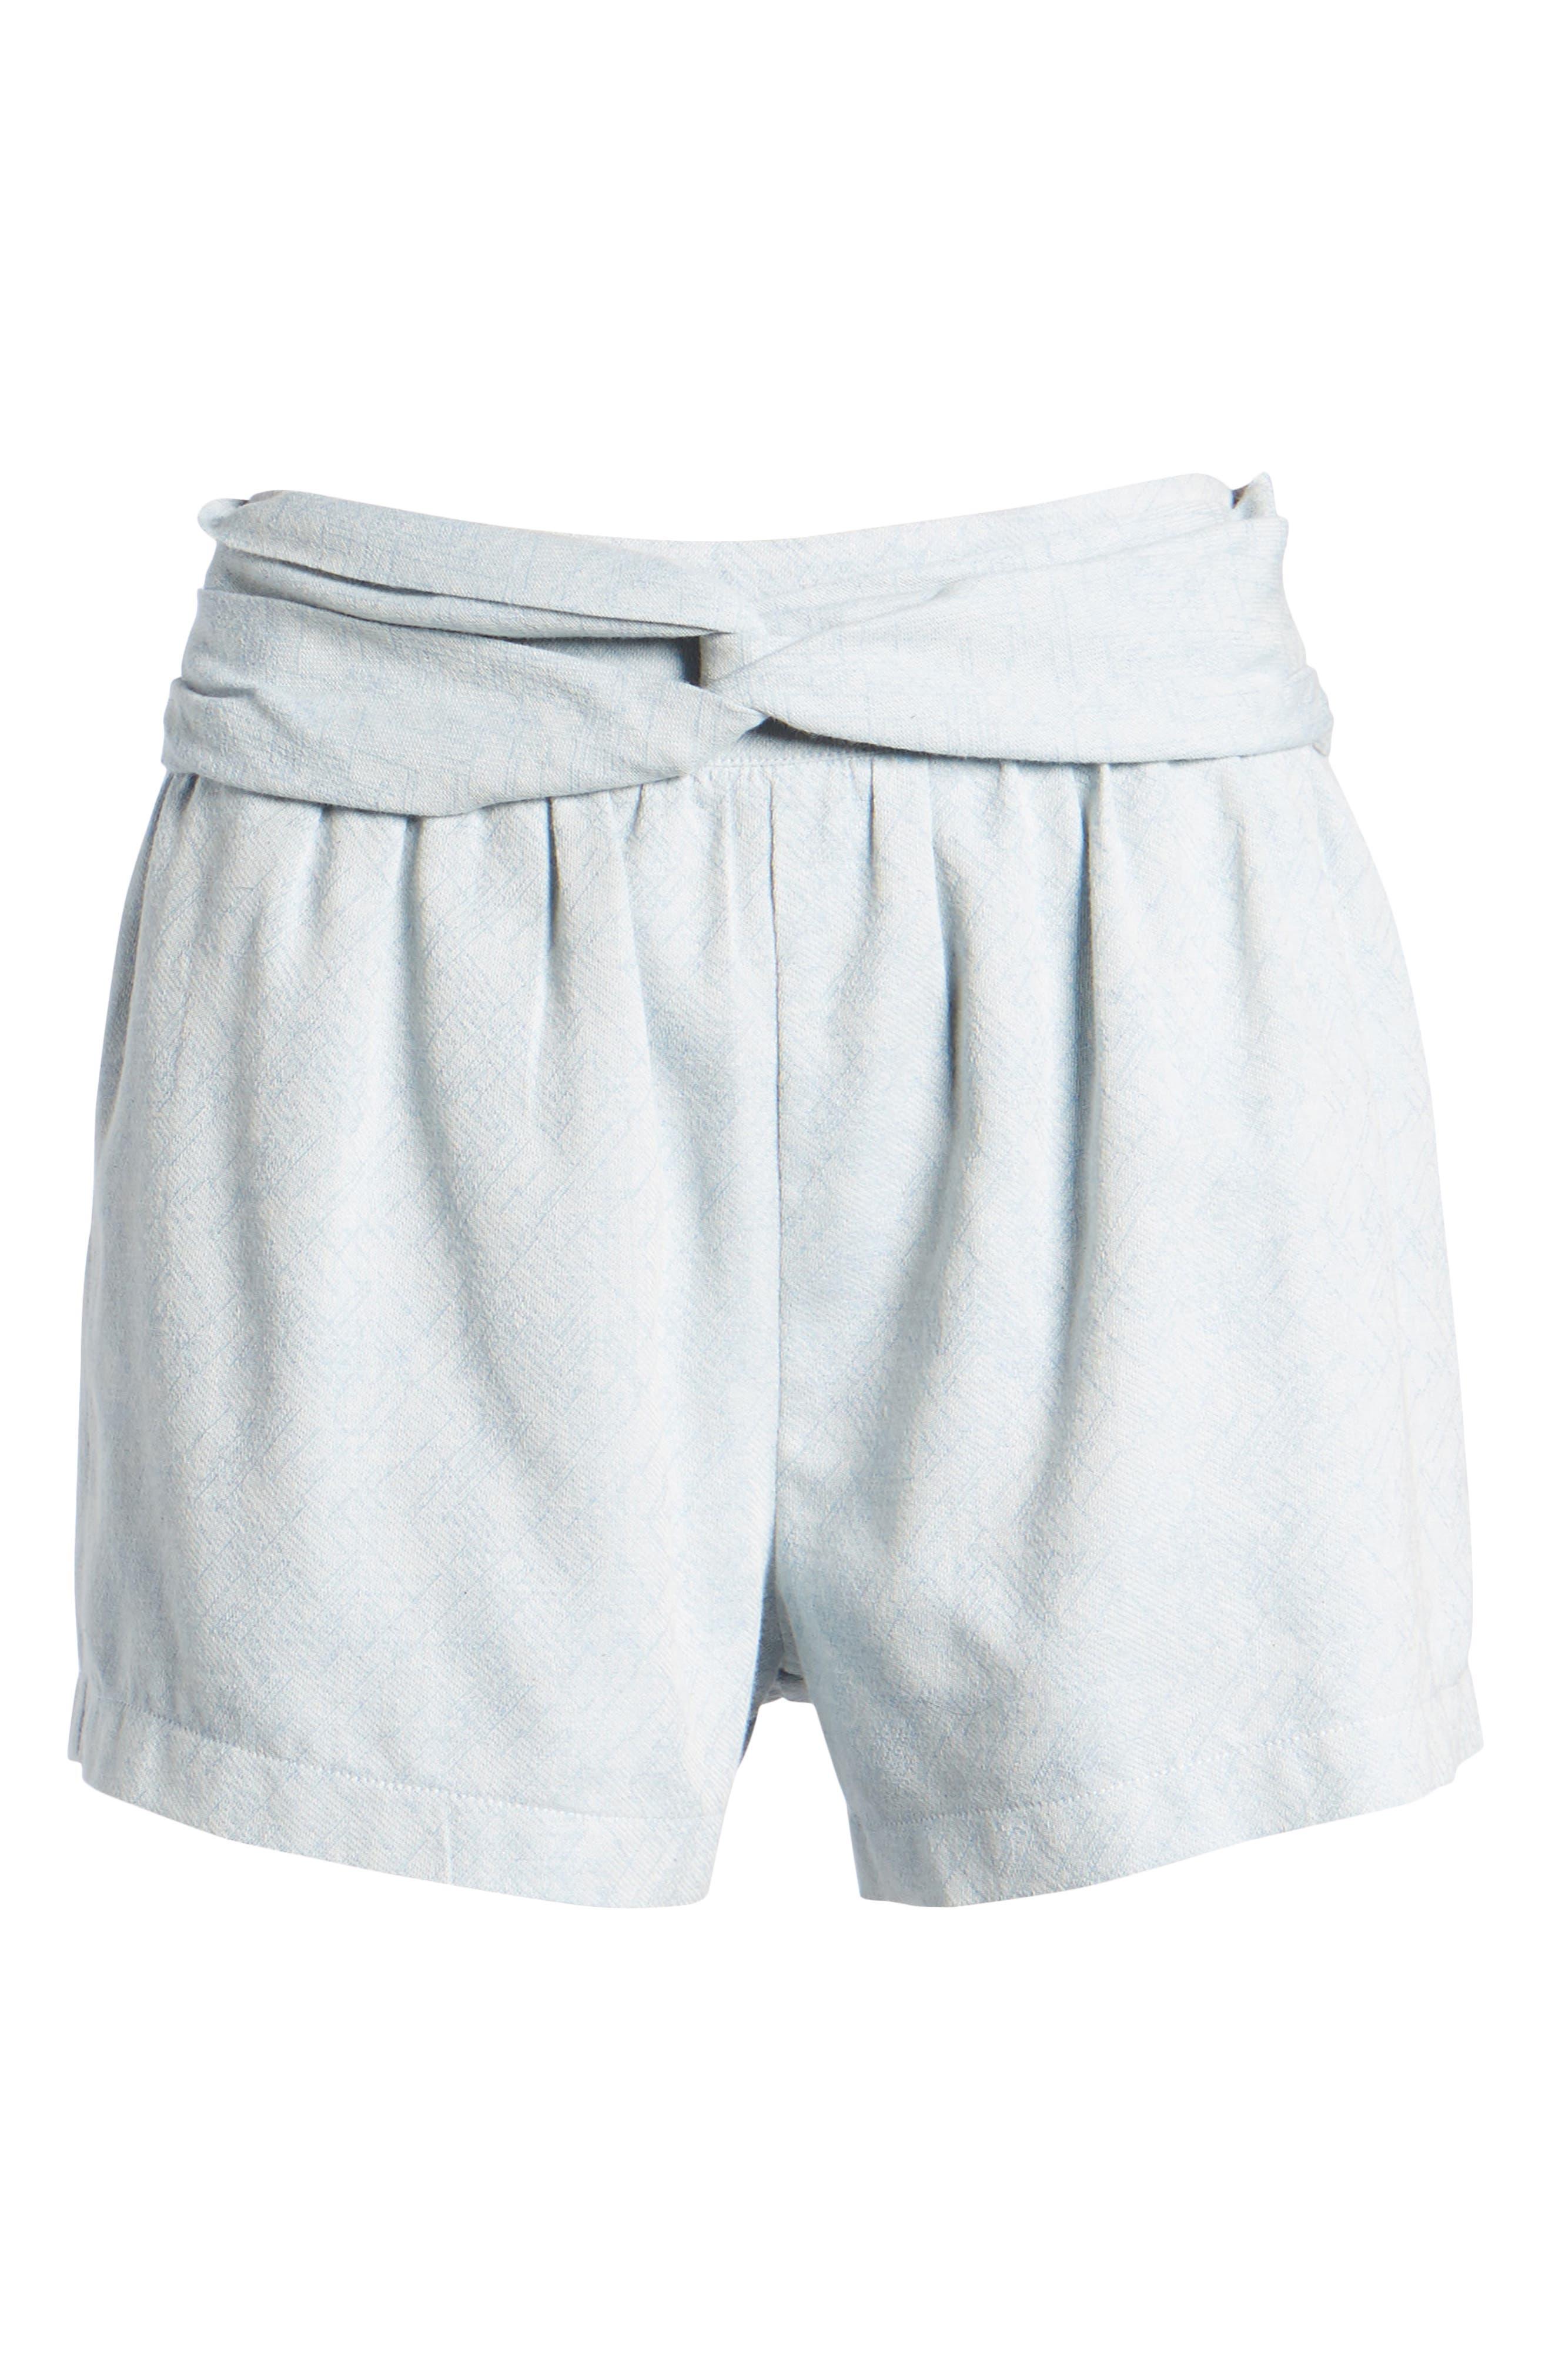 Knotted Jacquard Shorts,                             Alternate thumbnail 6, color,